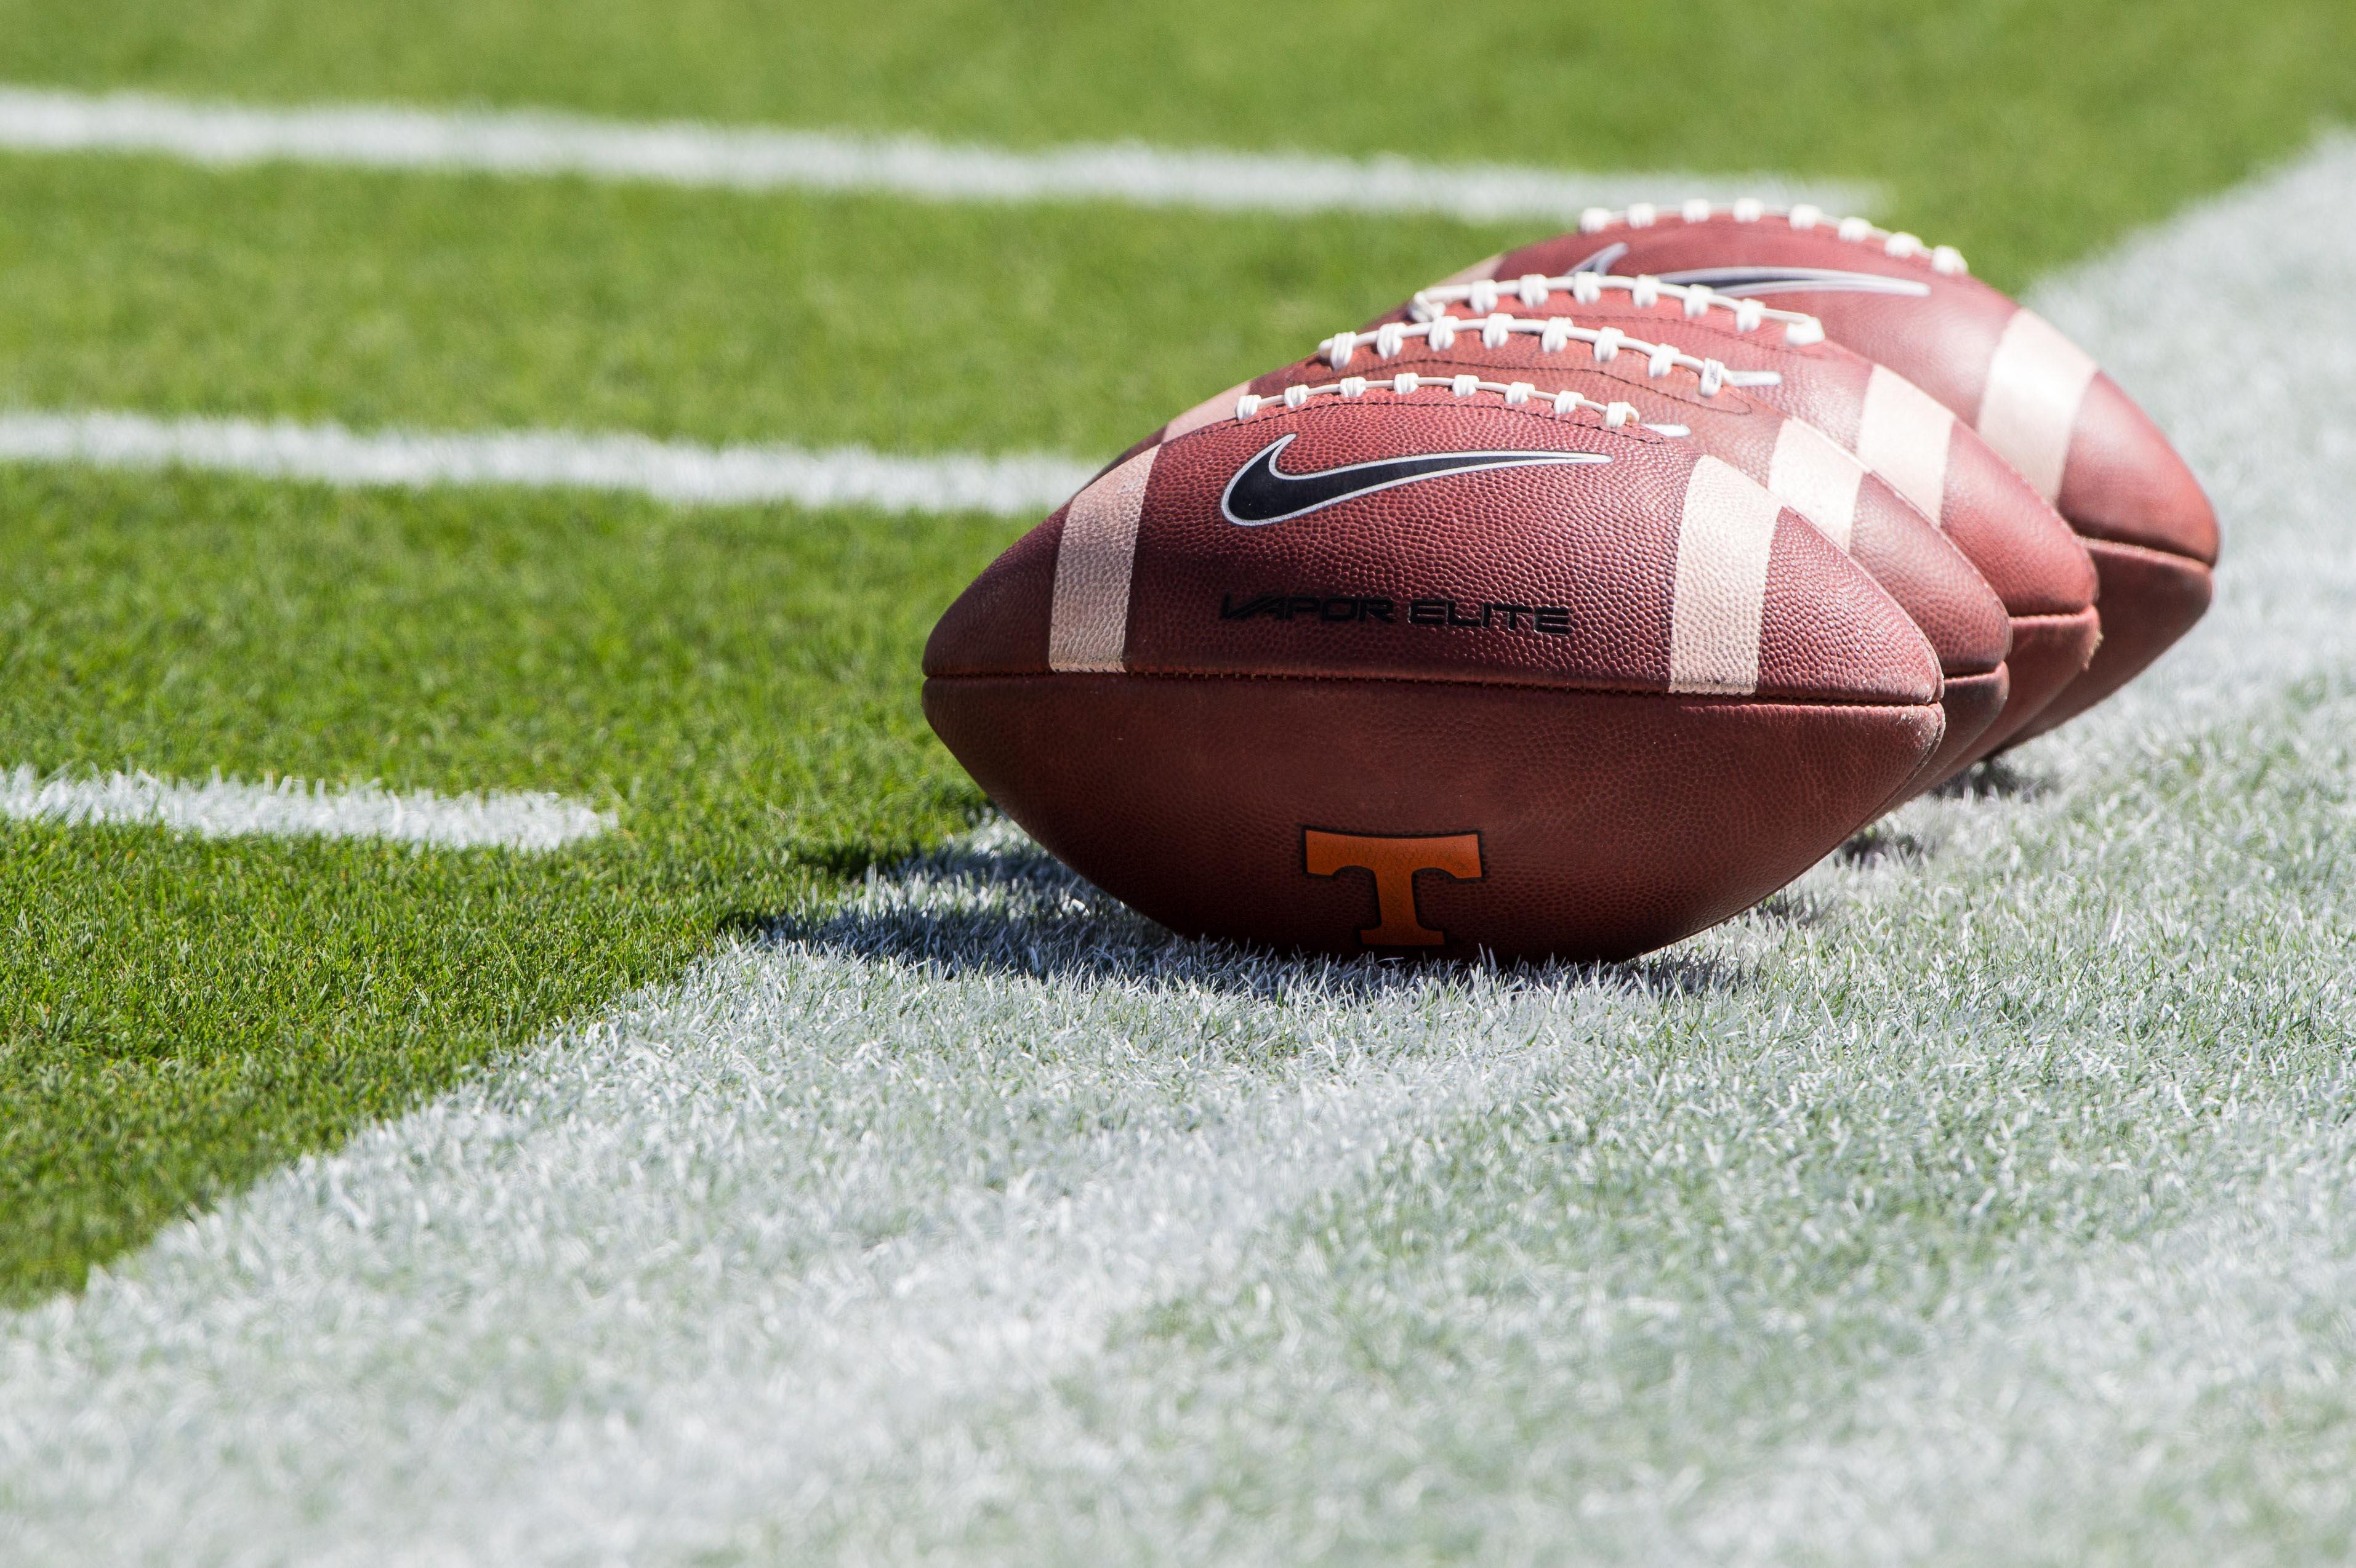 9611421-ncaa-football-tennessee-at-texas-aampampm